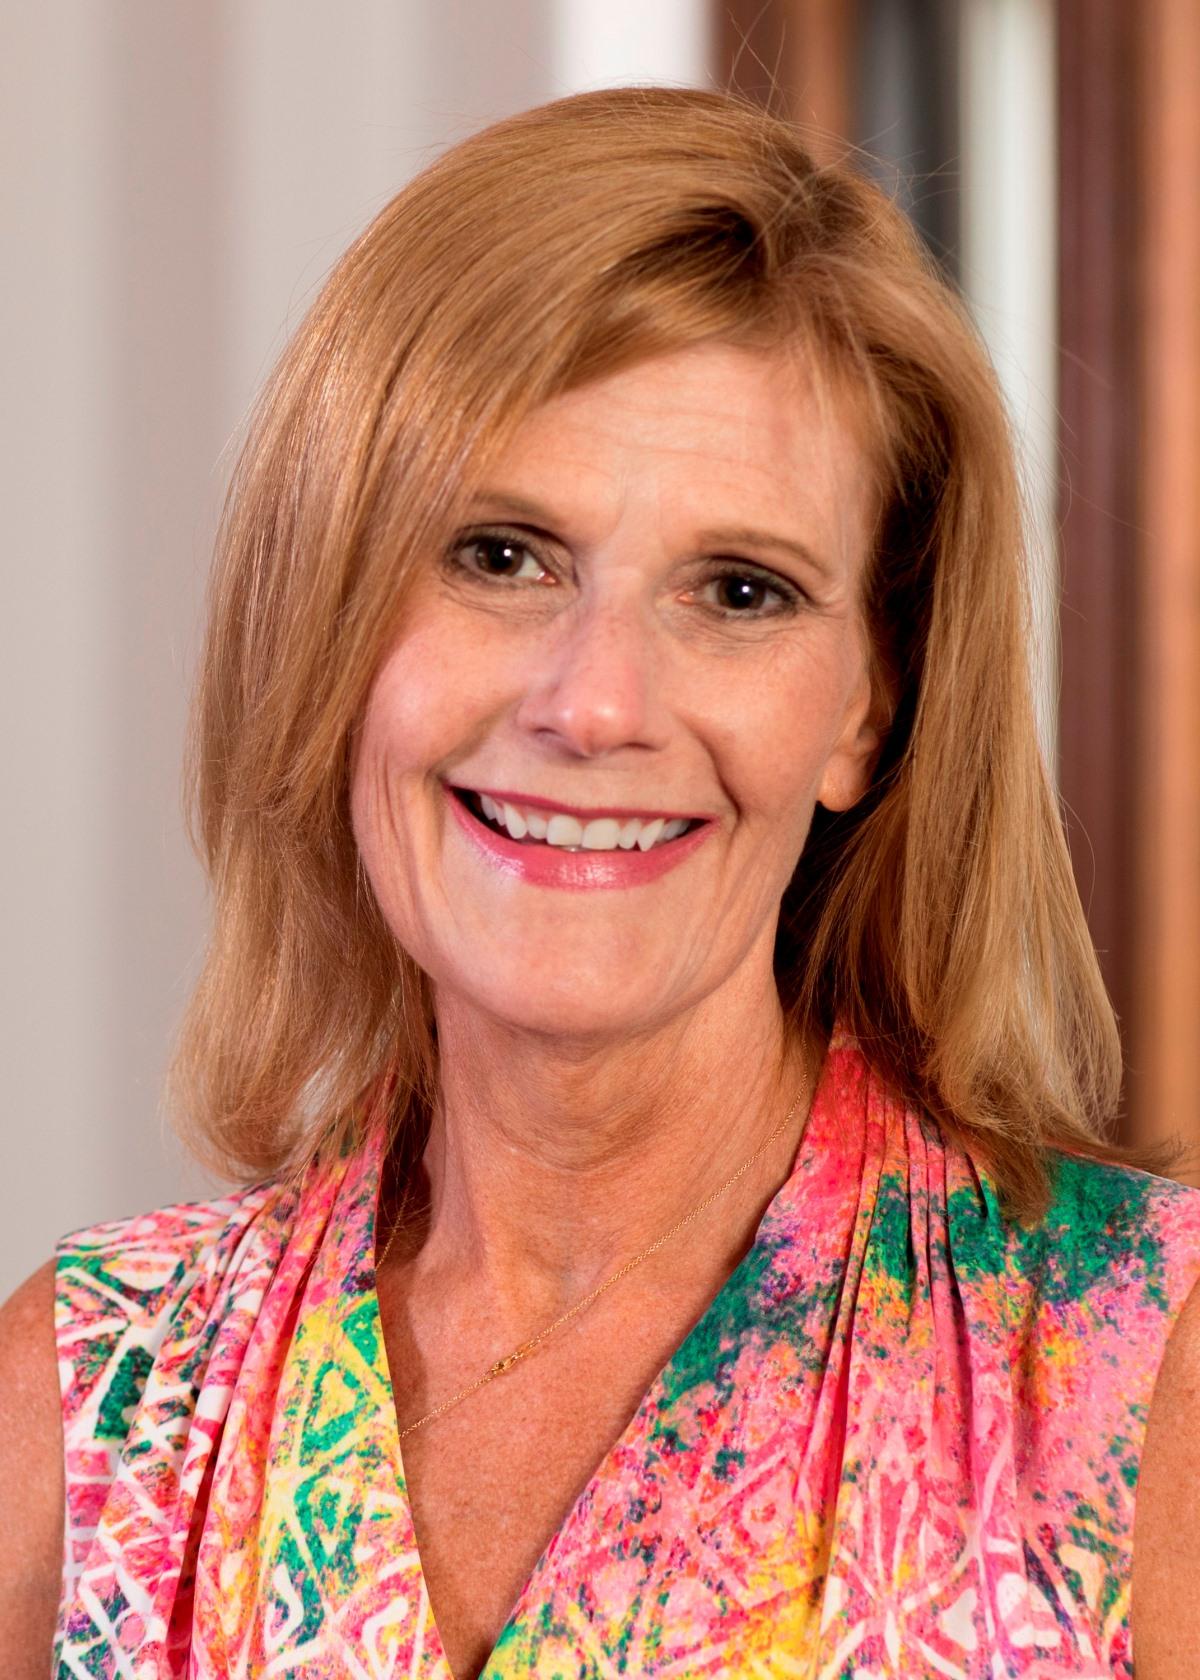 Rose Windmiller - Commissioner, Missouri